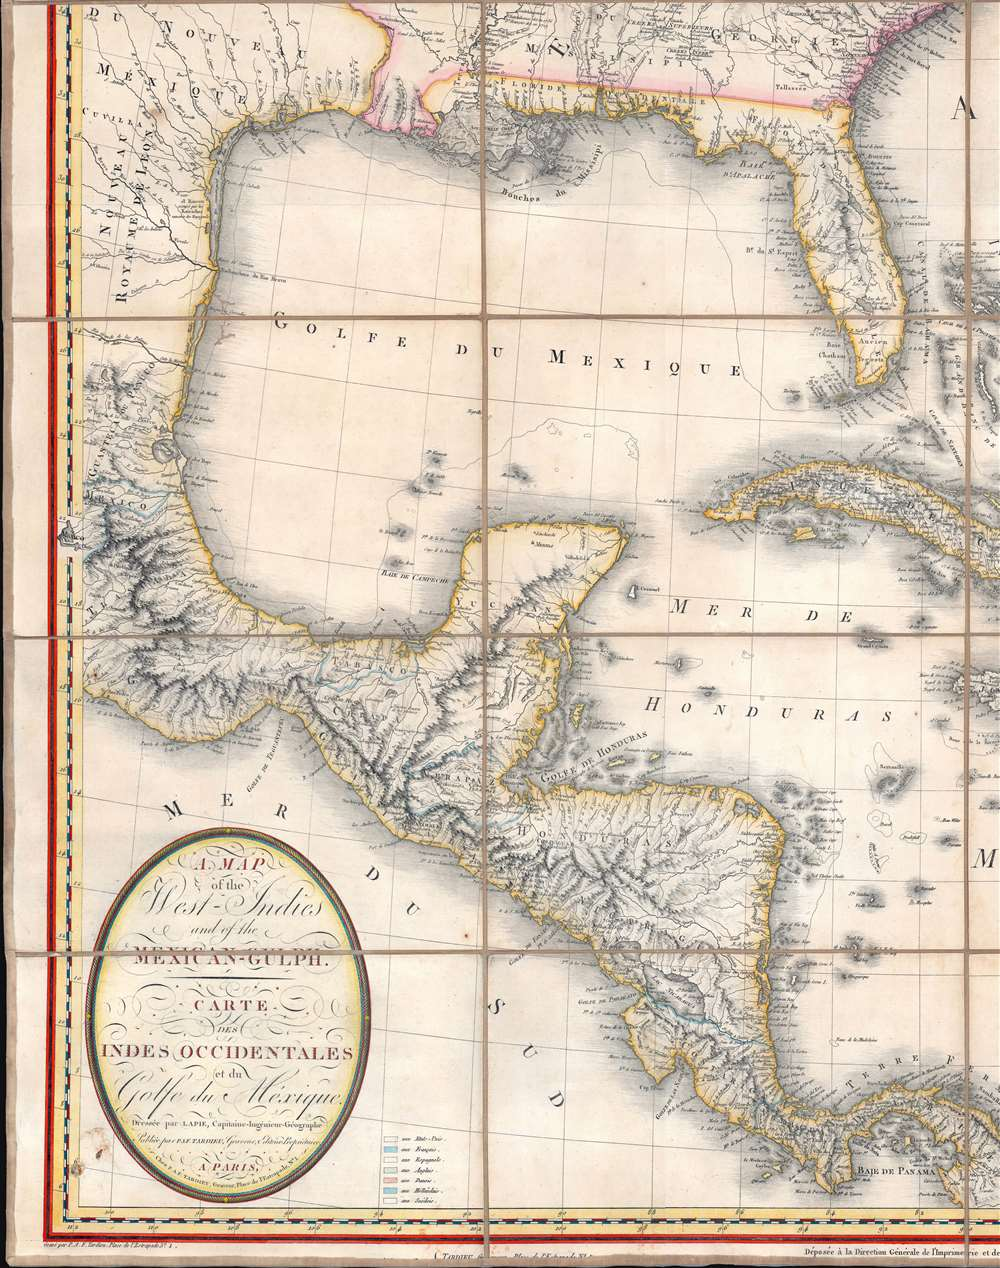 A Map of the United States and Canada, New-Scotland, New-Brunswick and New-Foundland. / Carte des Etats-Unis, avec le Canada, La Nouvelle Ecosse, Le Nouveau Brunswick et Terre-Neuve. / A Map of the West-Indies and of the Mexican-Gulph. / Carte des Indies Occidental et du Golfe du Méxique. - Alternate View 4